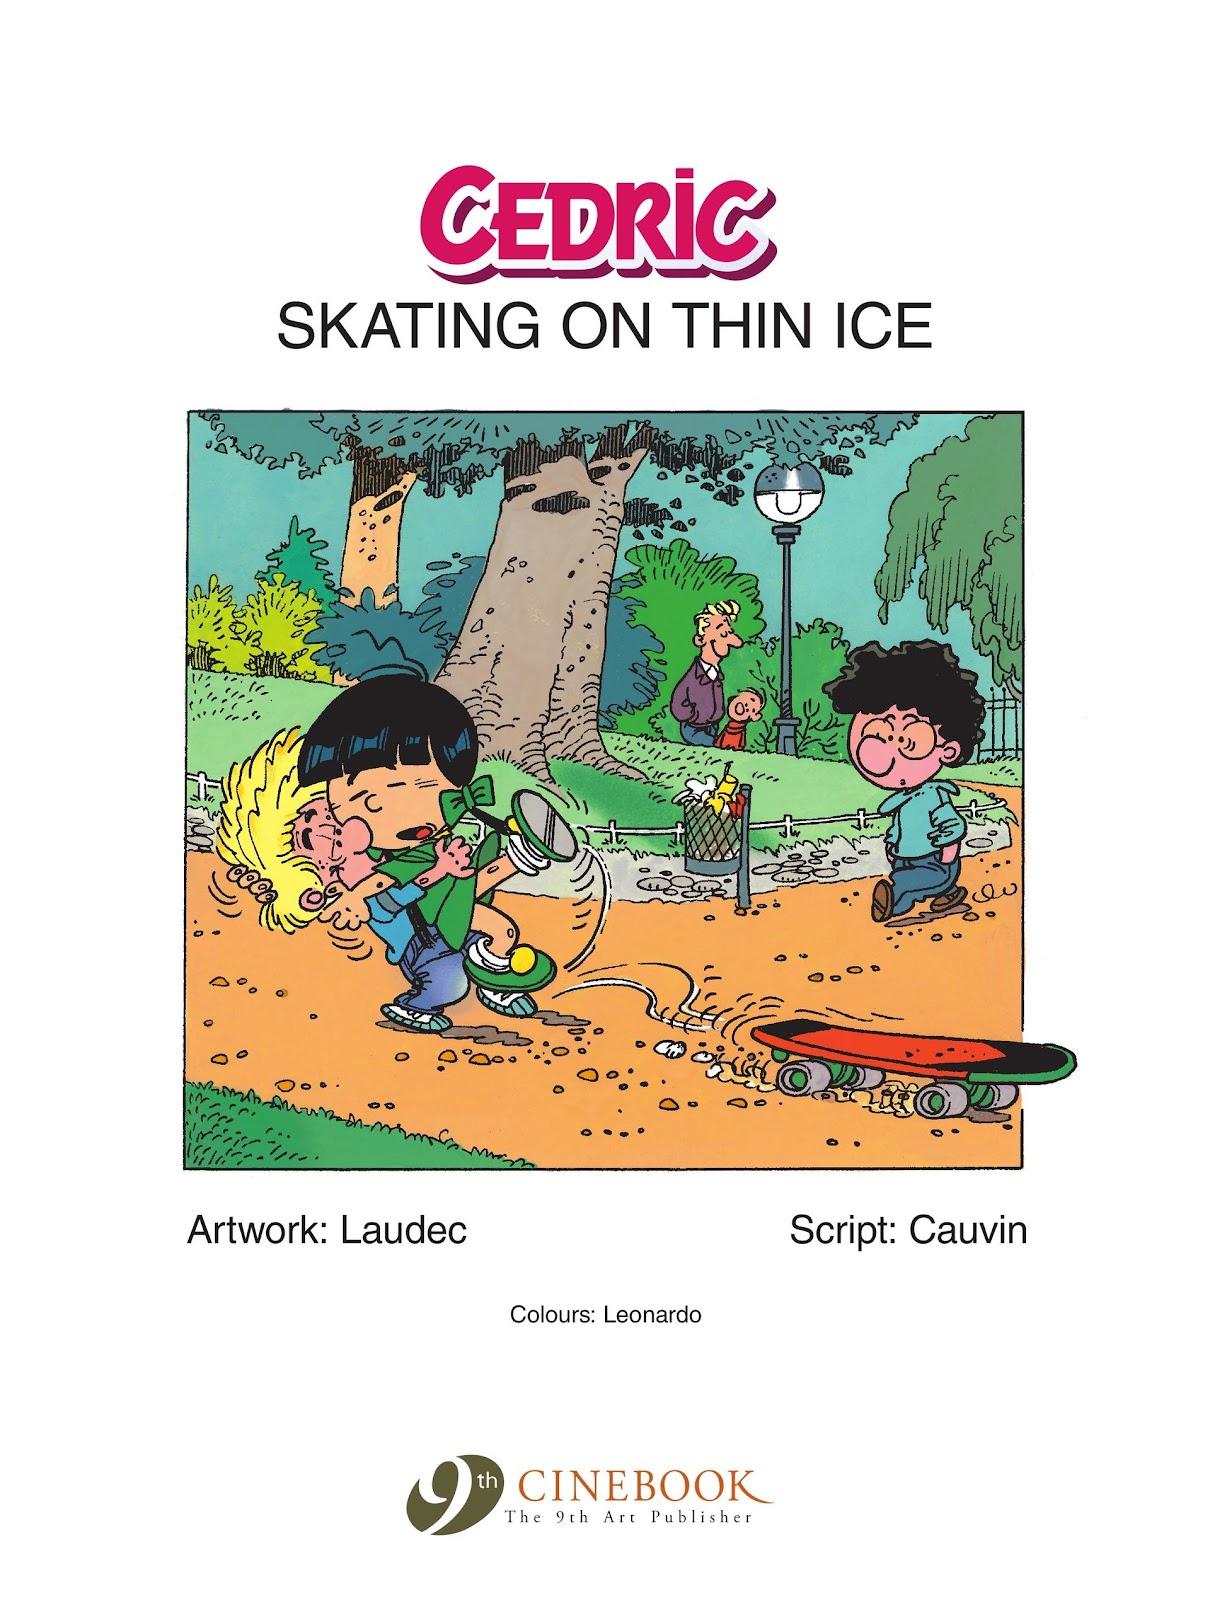 Read online Cedric comic -  Issue #6 - 3